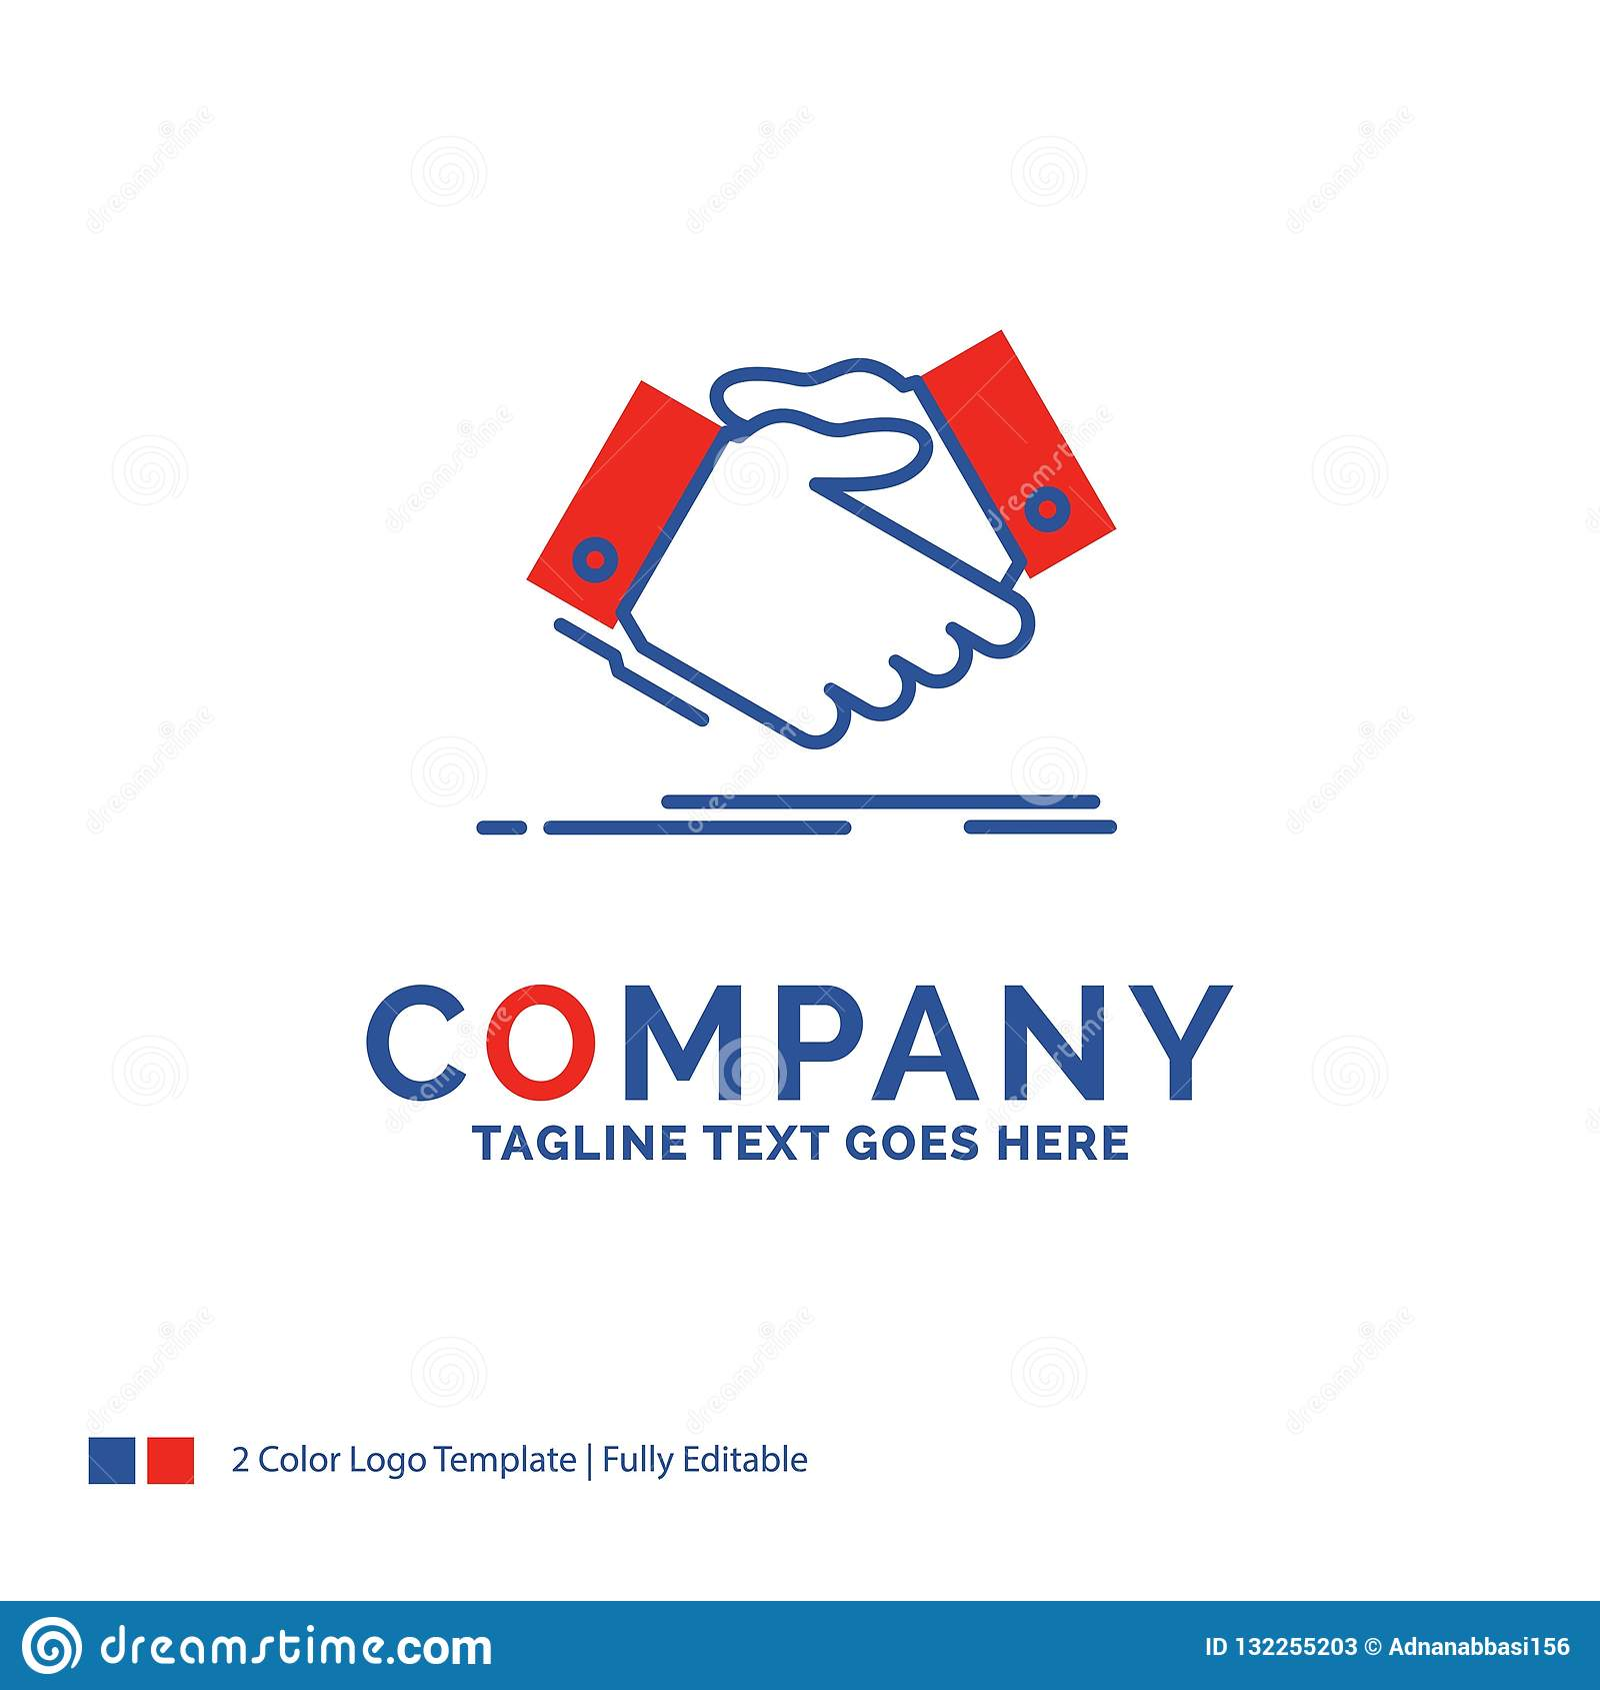 Company Name Logo Design For handshake, hand shake, shaking hand